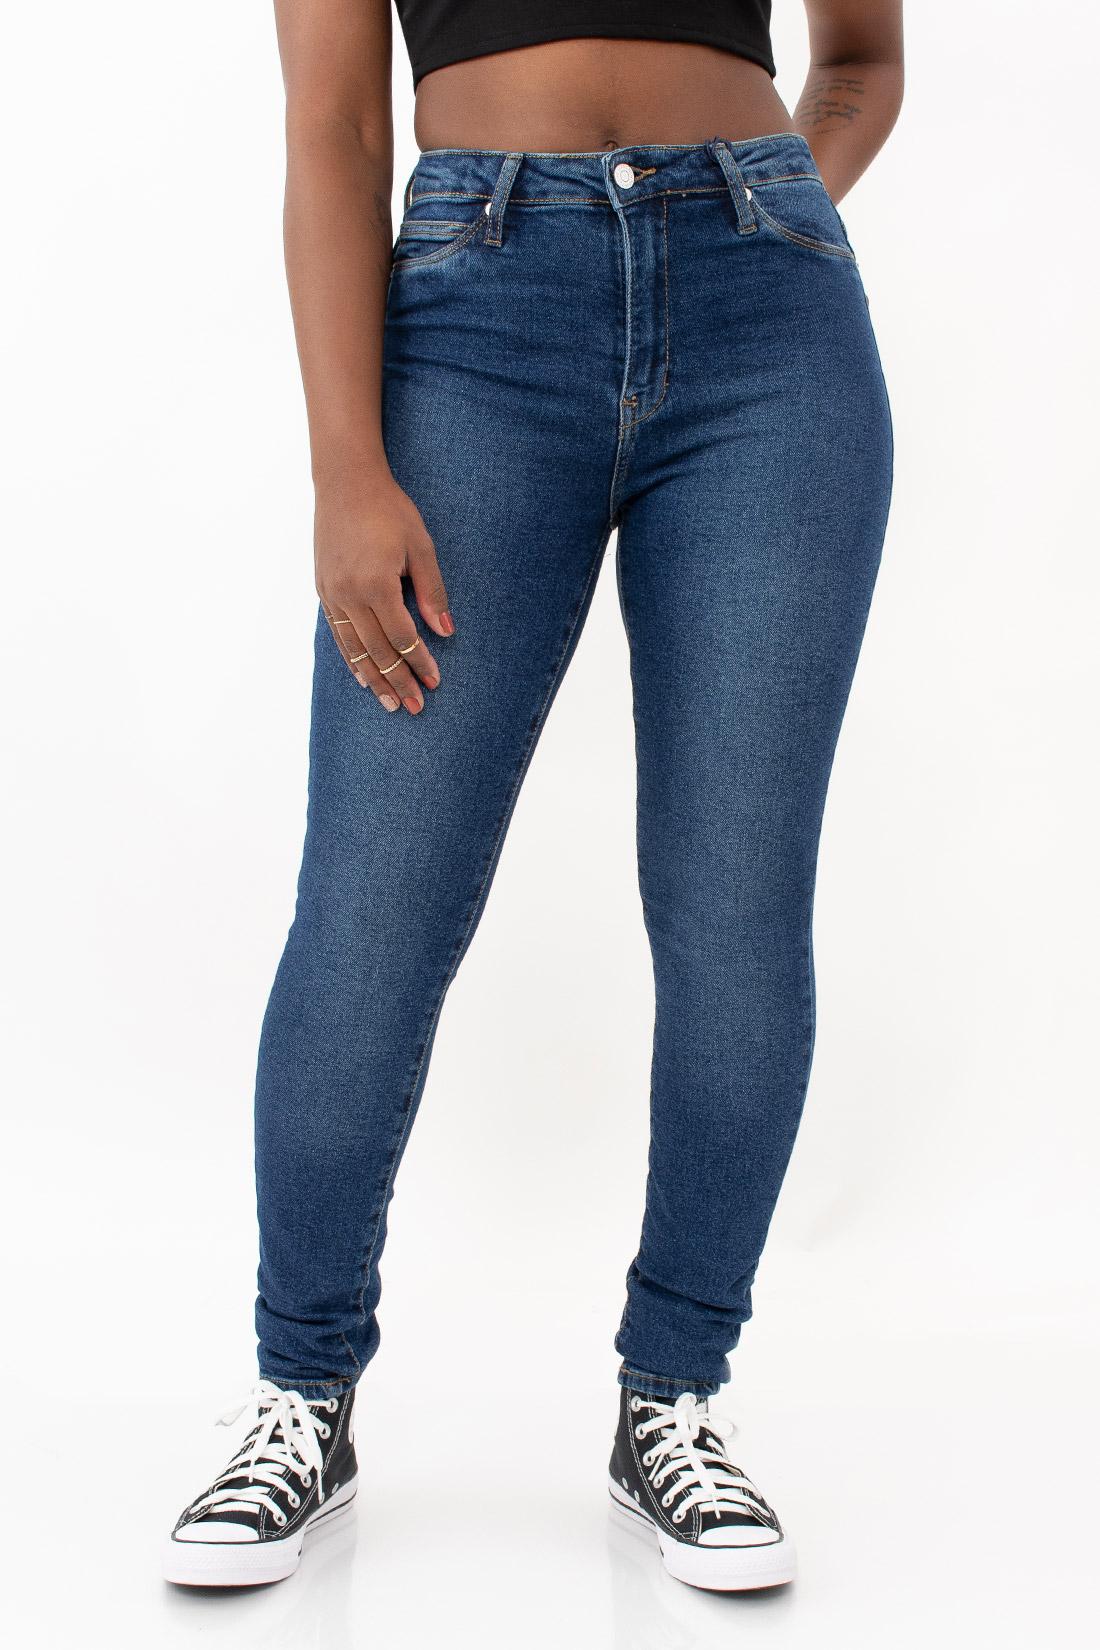 Calca Jeans Tommy Hilfiger Sylvia